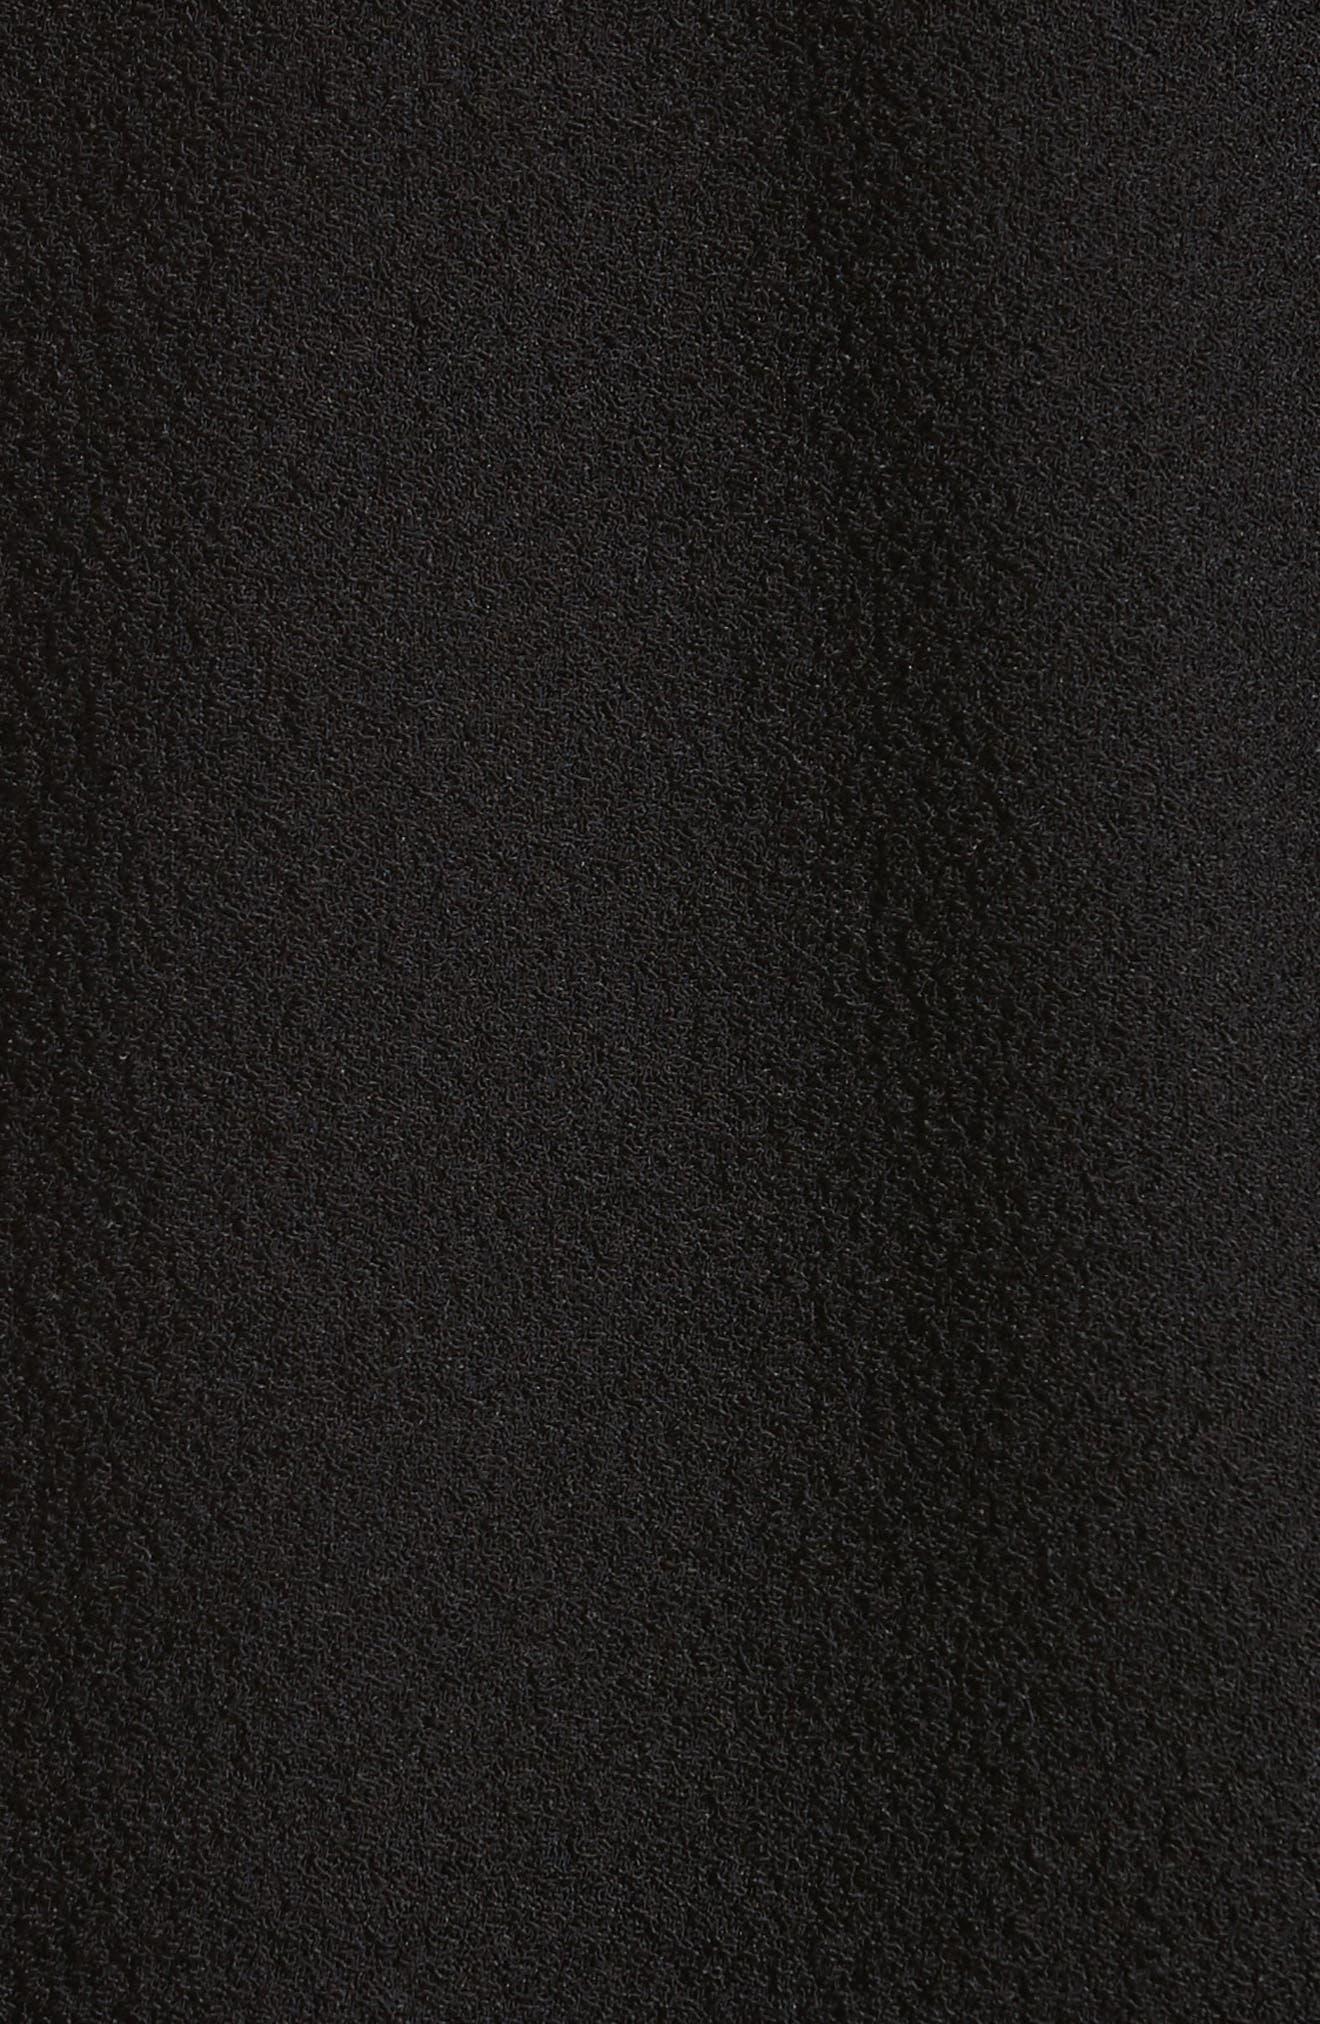 Sofie Puff Sleeve Crepe Blouse,                             Alternate thumbnail 5, color,                             001